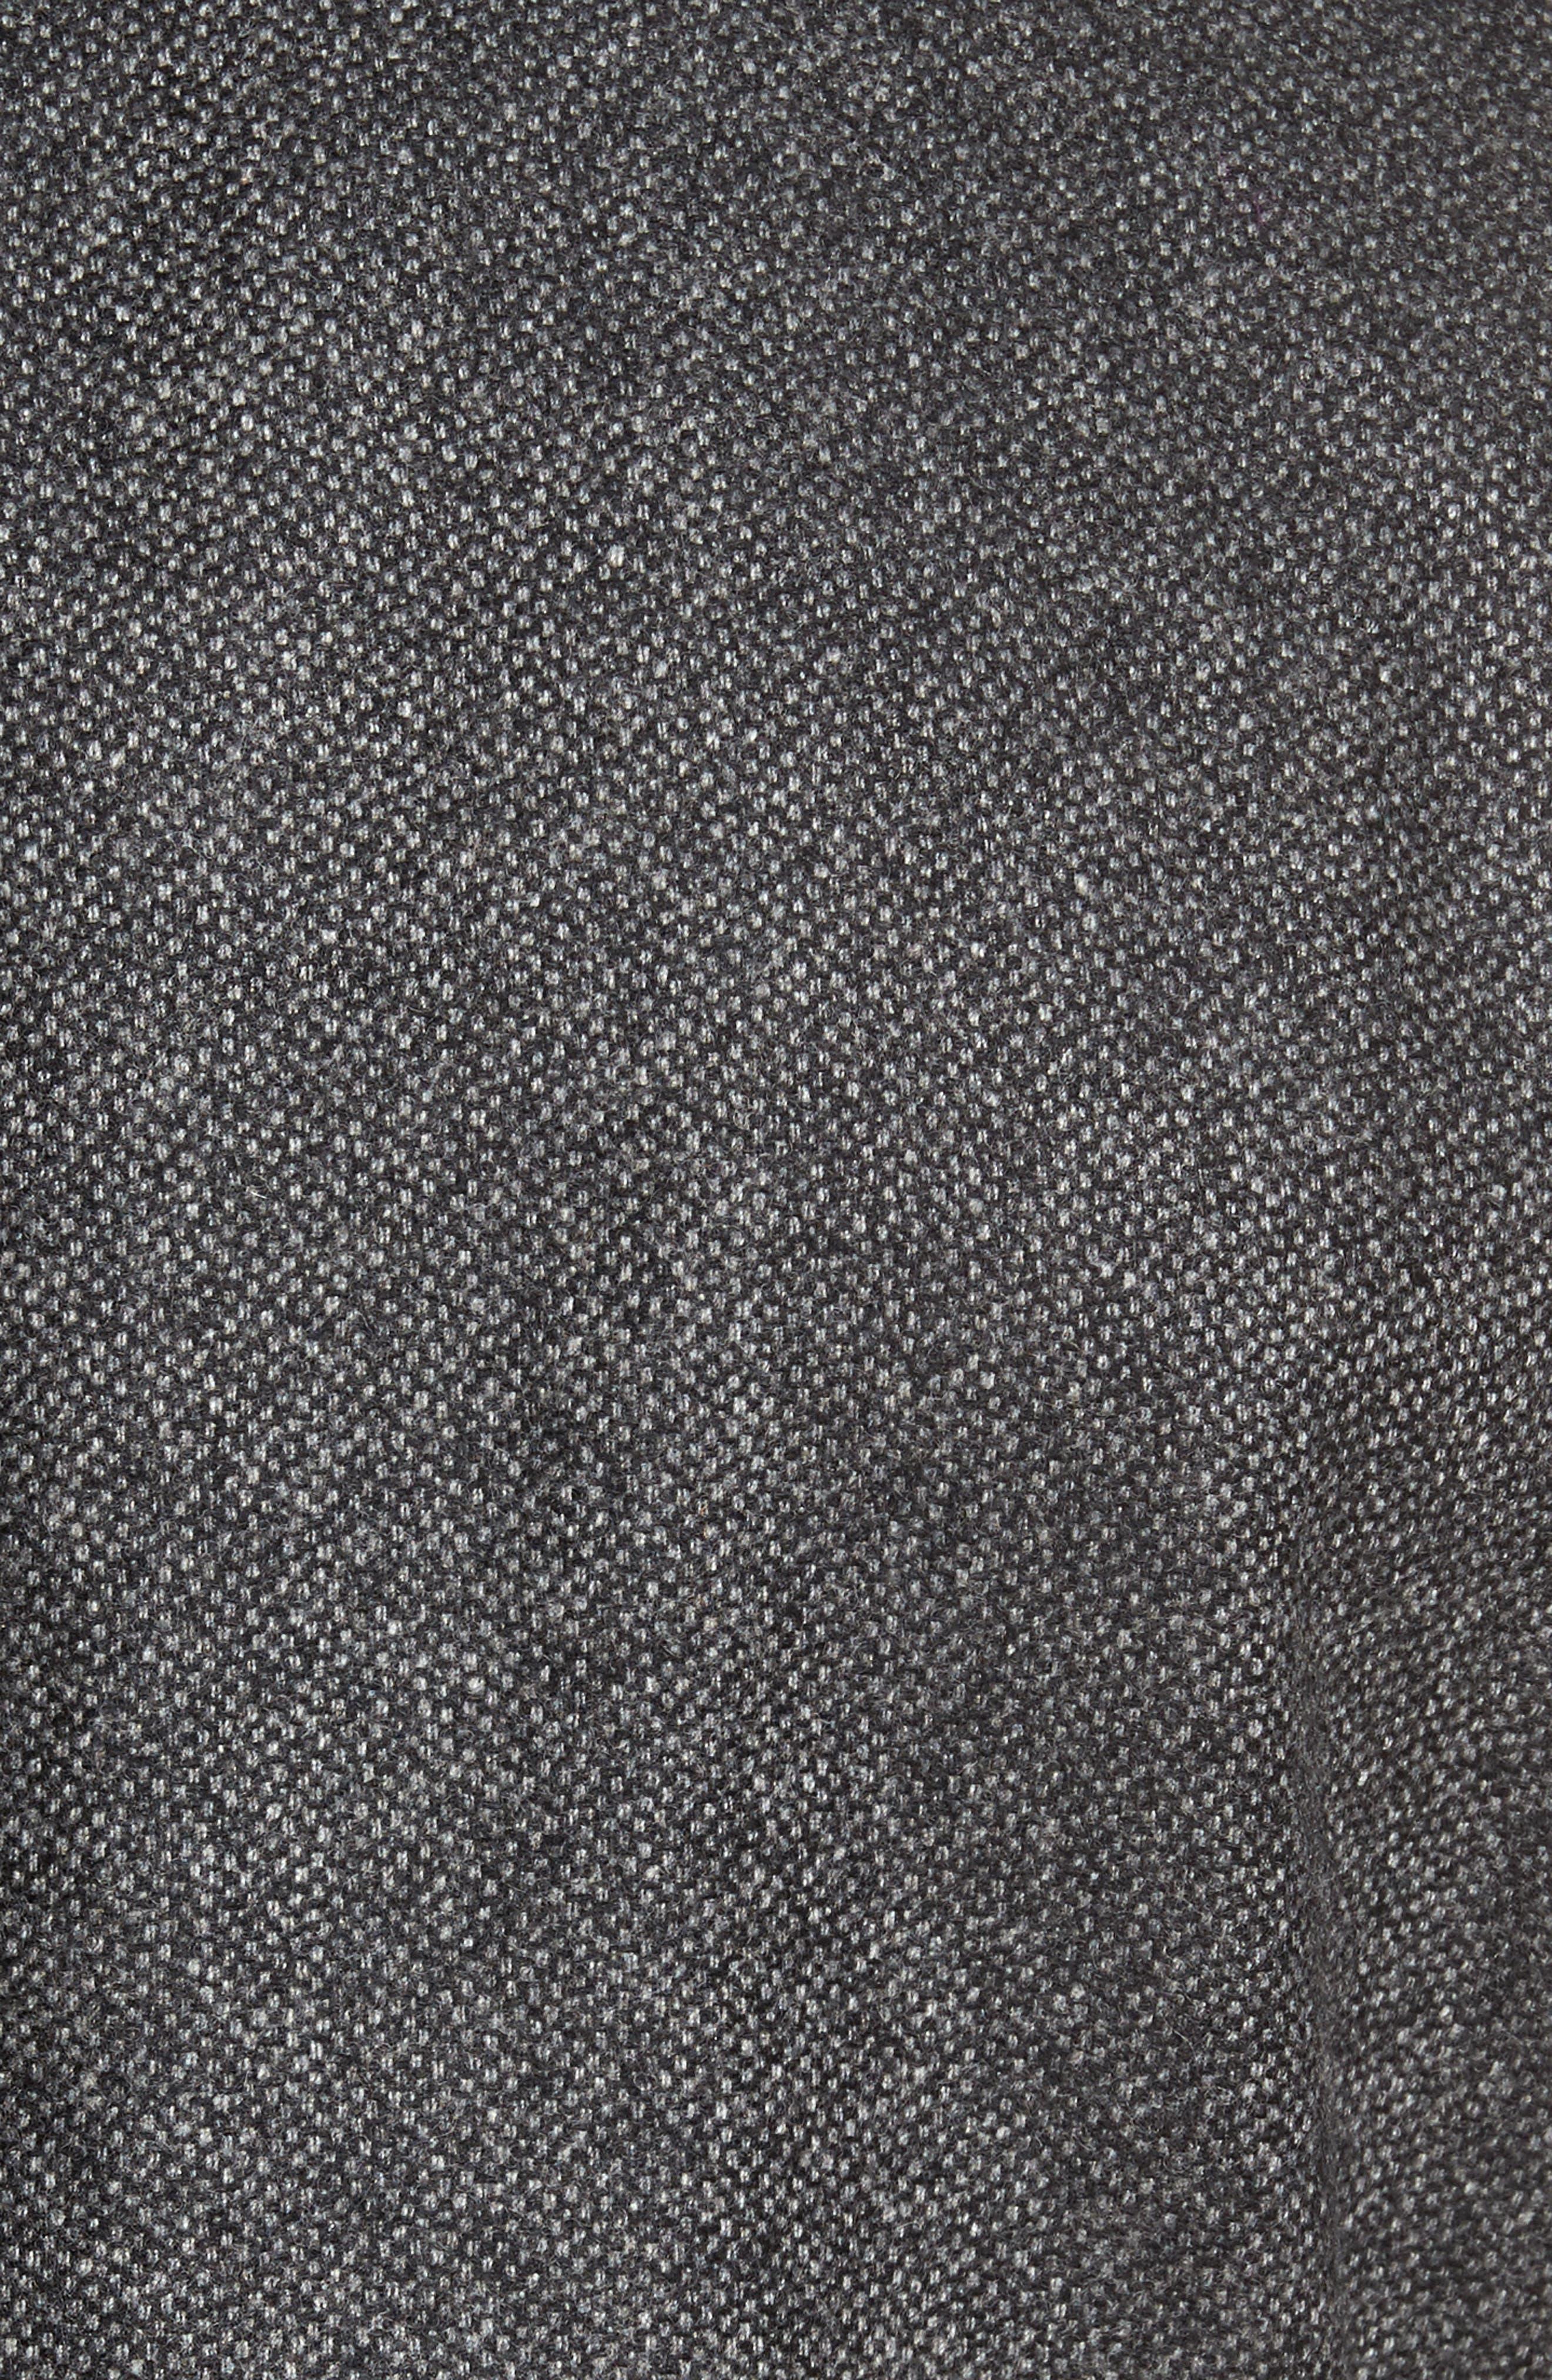 Modern Slim Fit Textured Blazer,                             Alternate thumbnail 6, color,                             010